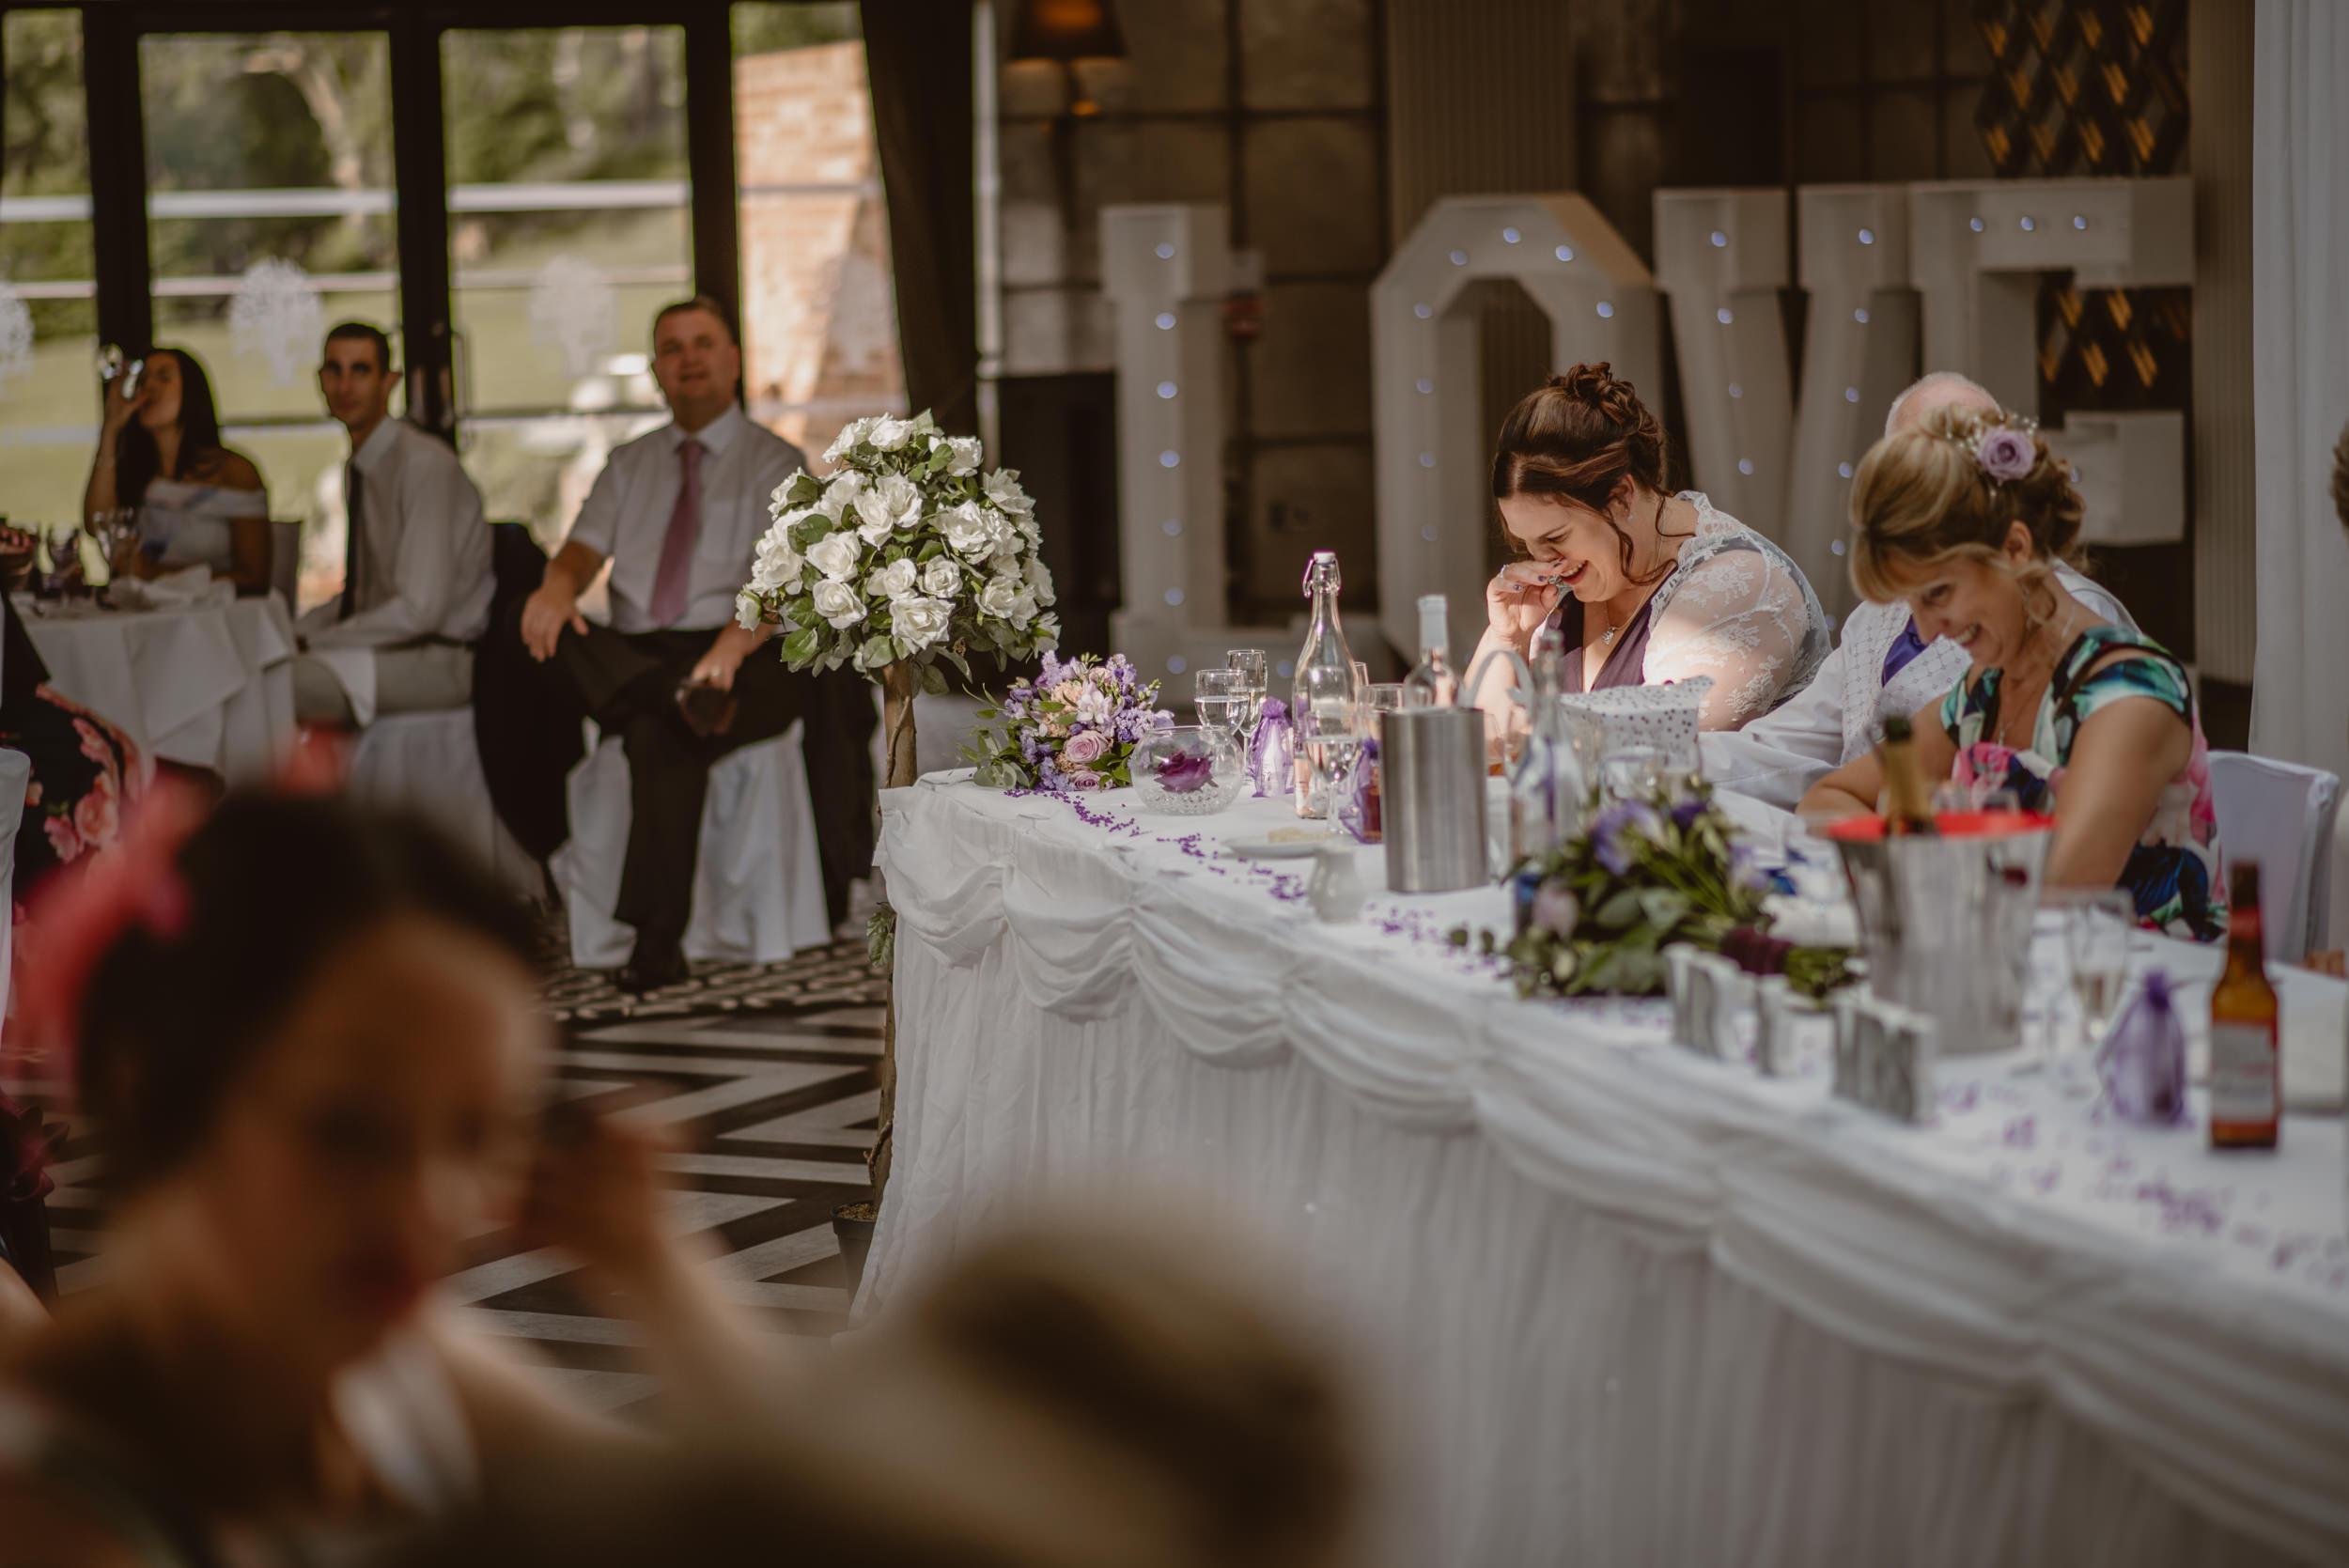 Chantelle-and-Stephen-Old-Thorns-Hotel-Wedding-Liphook-Manu-Mendoza-Wedding-Photography-423.jpg